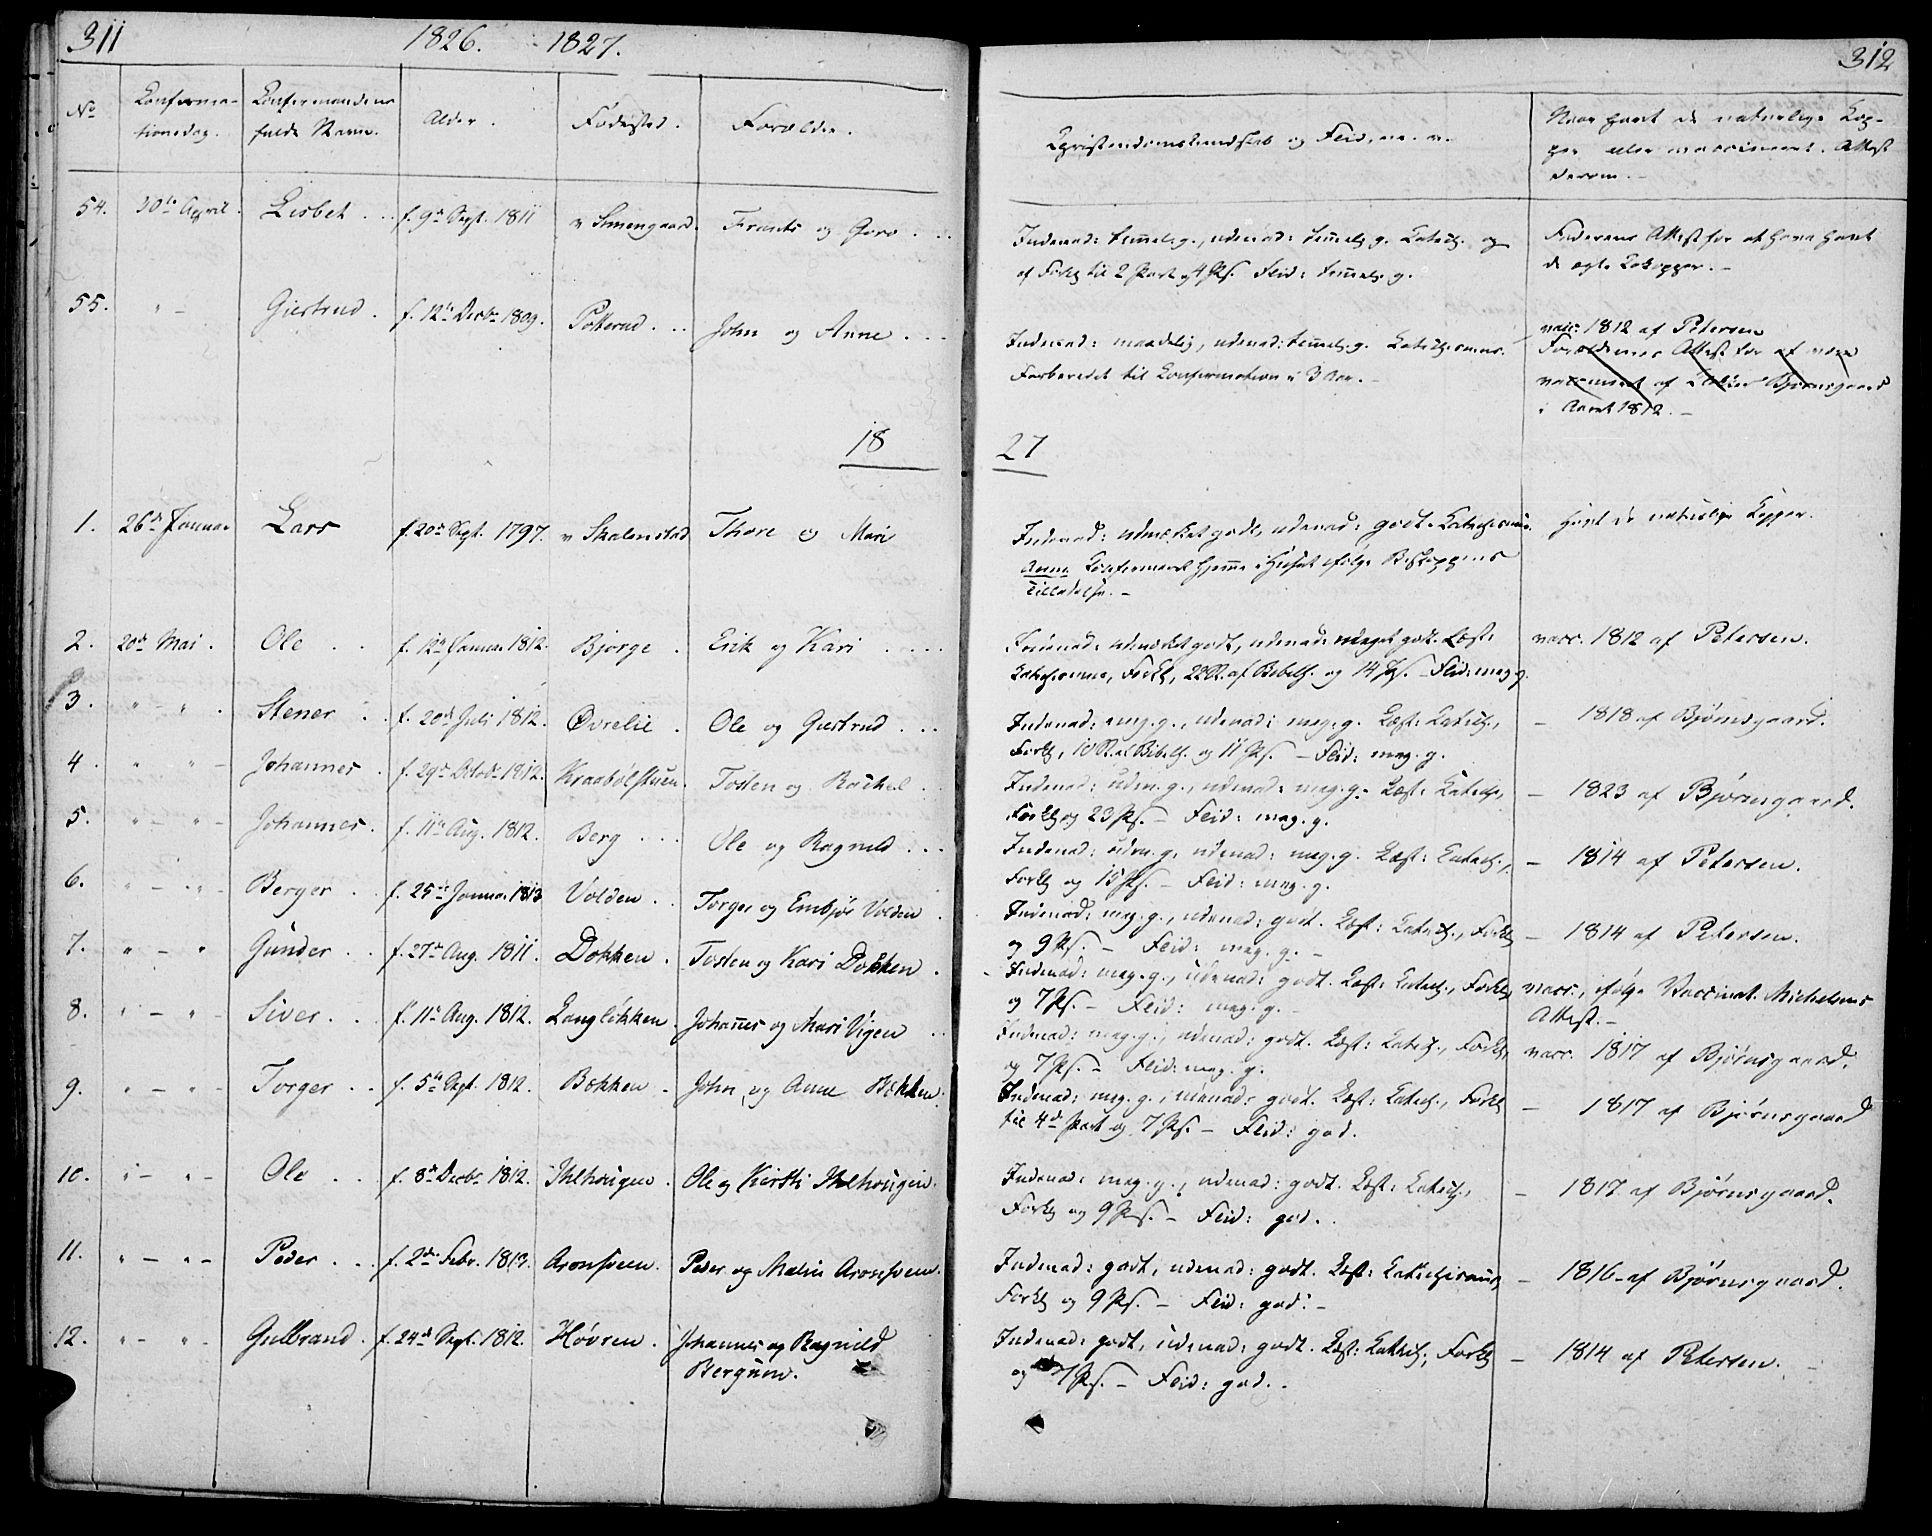 SAH, Øyer prestekontor, Ministerialbok nr. 4, 1824-1841, s. 311-312